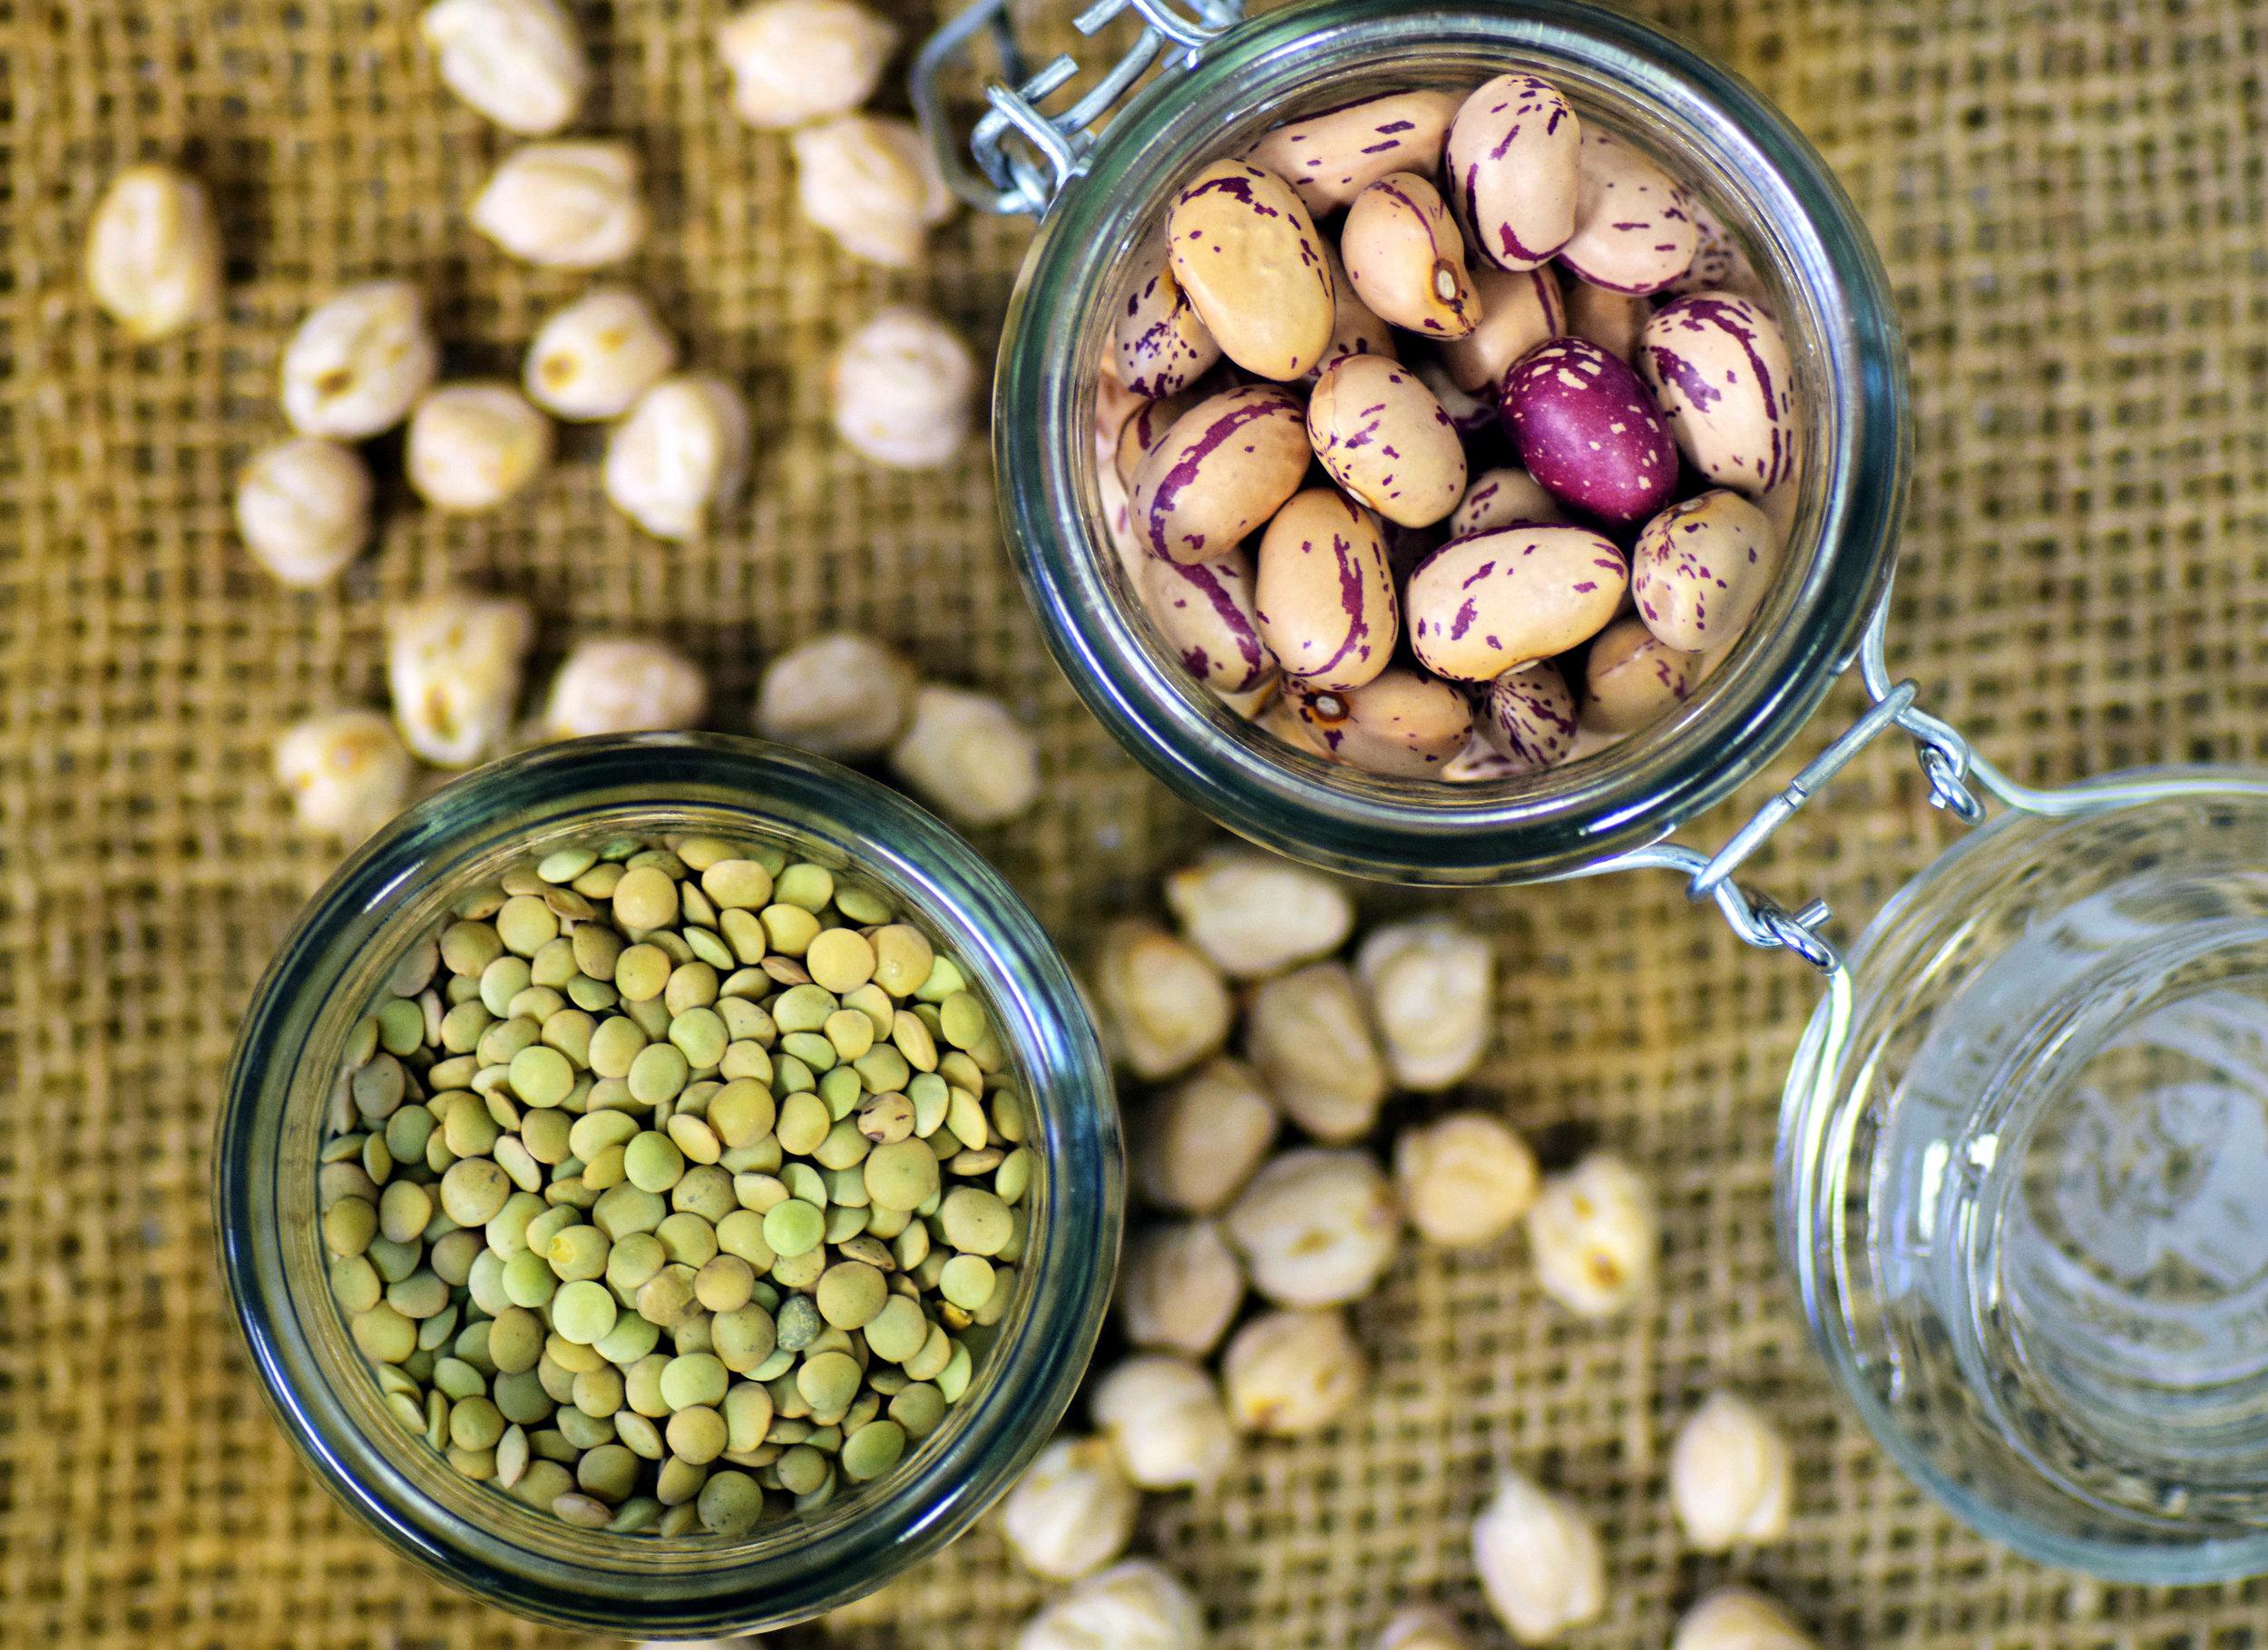 Canva - Beans, Lenses, Quail Beans, Legumes, Food, Meatless.jpg